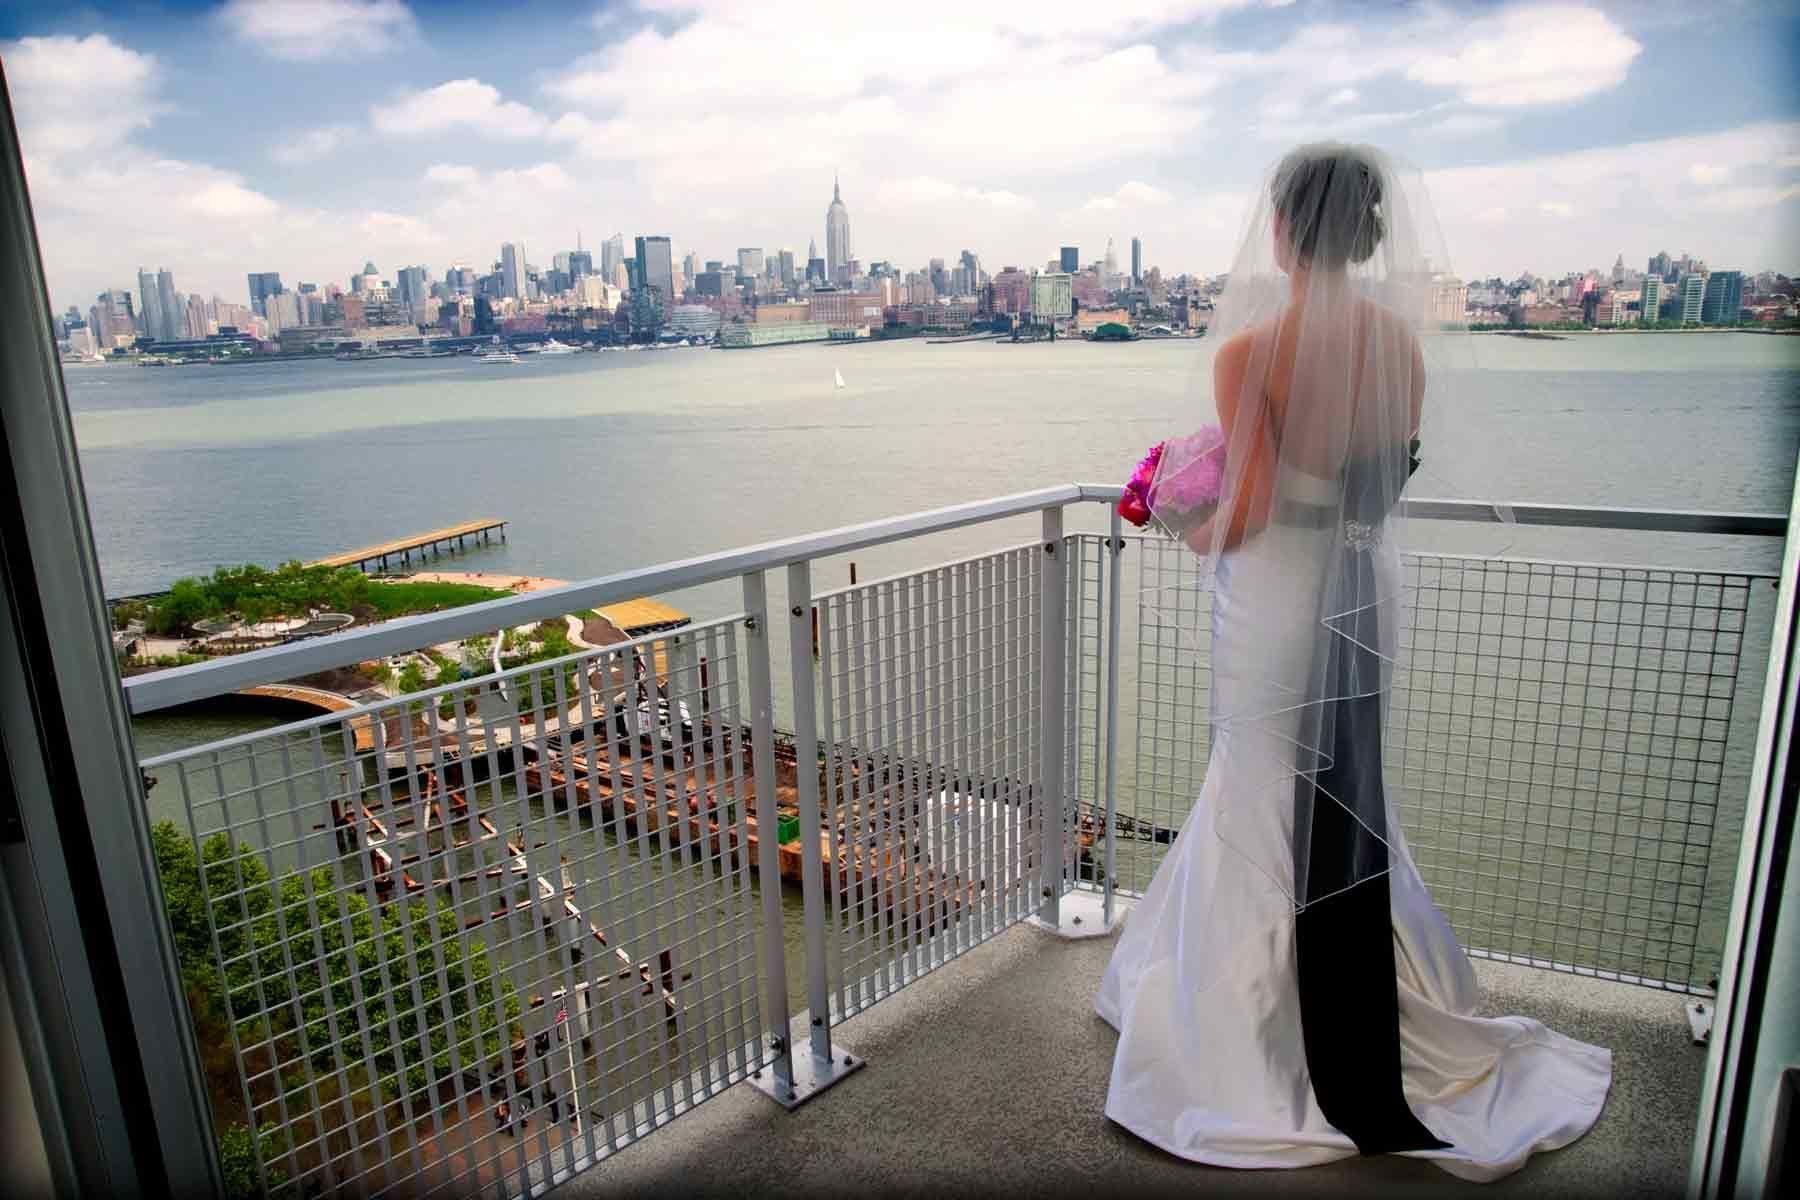 1studiobrooke_manhattanpenthouse_wedding_photography_0003a